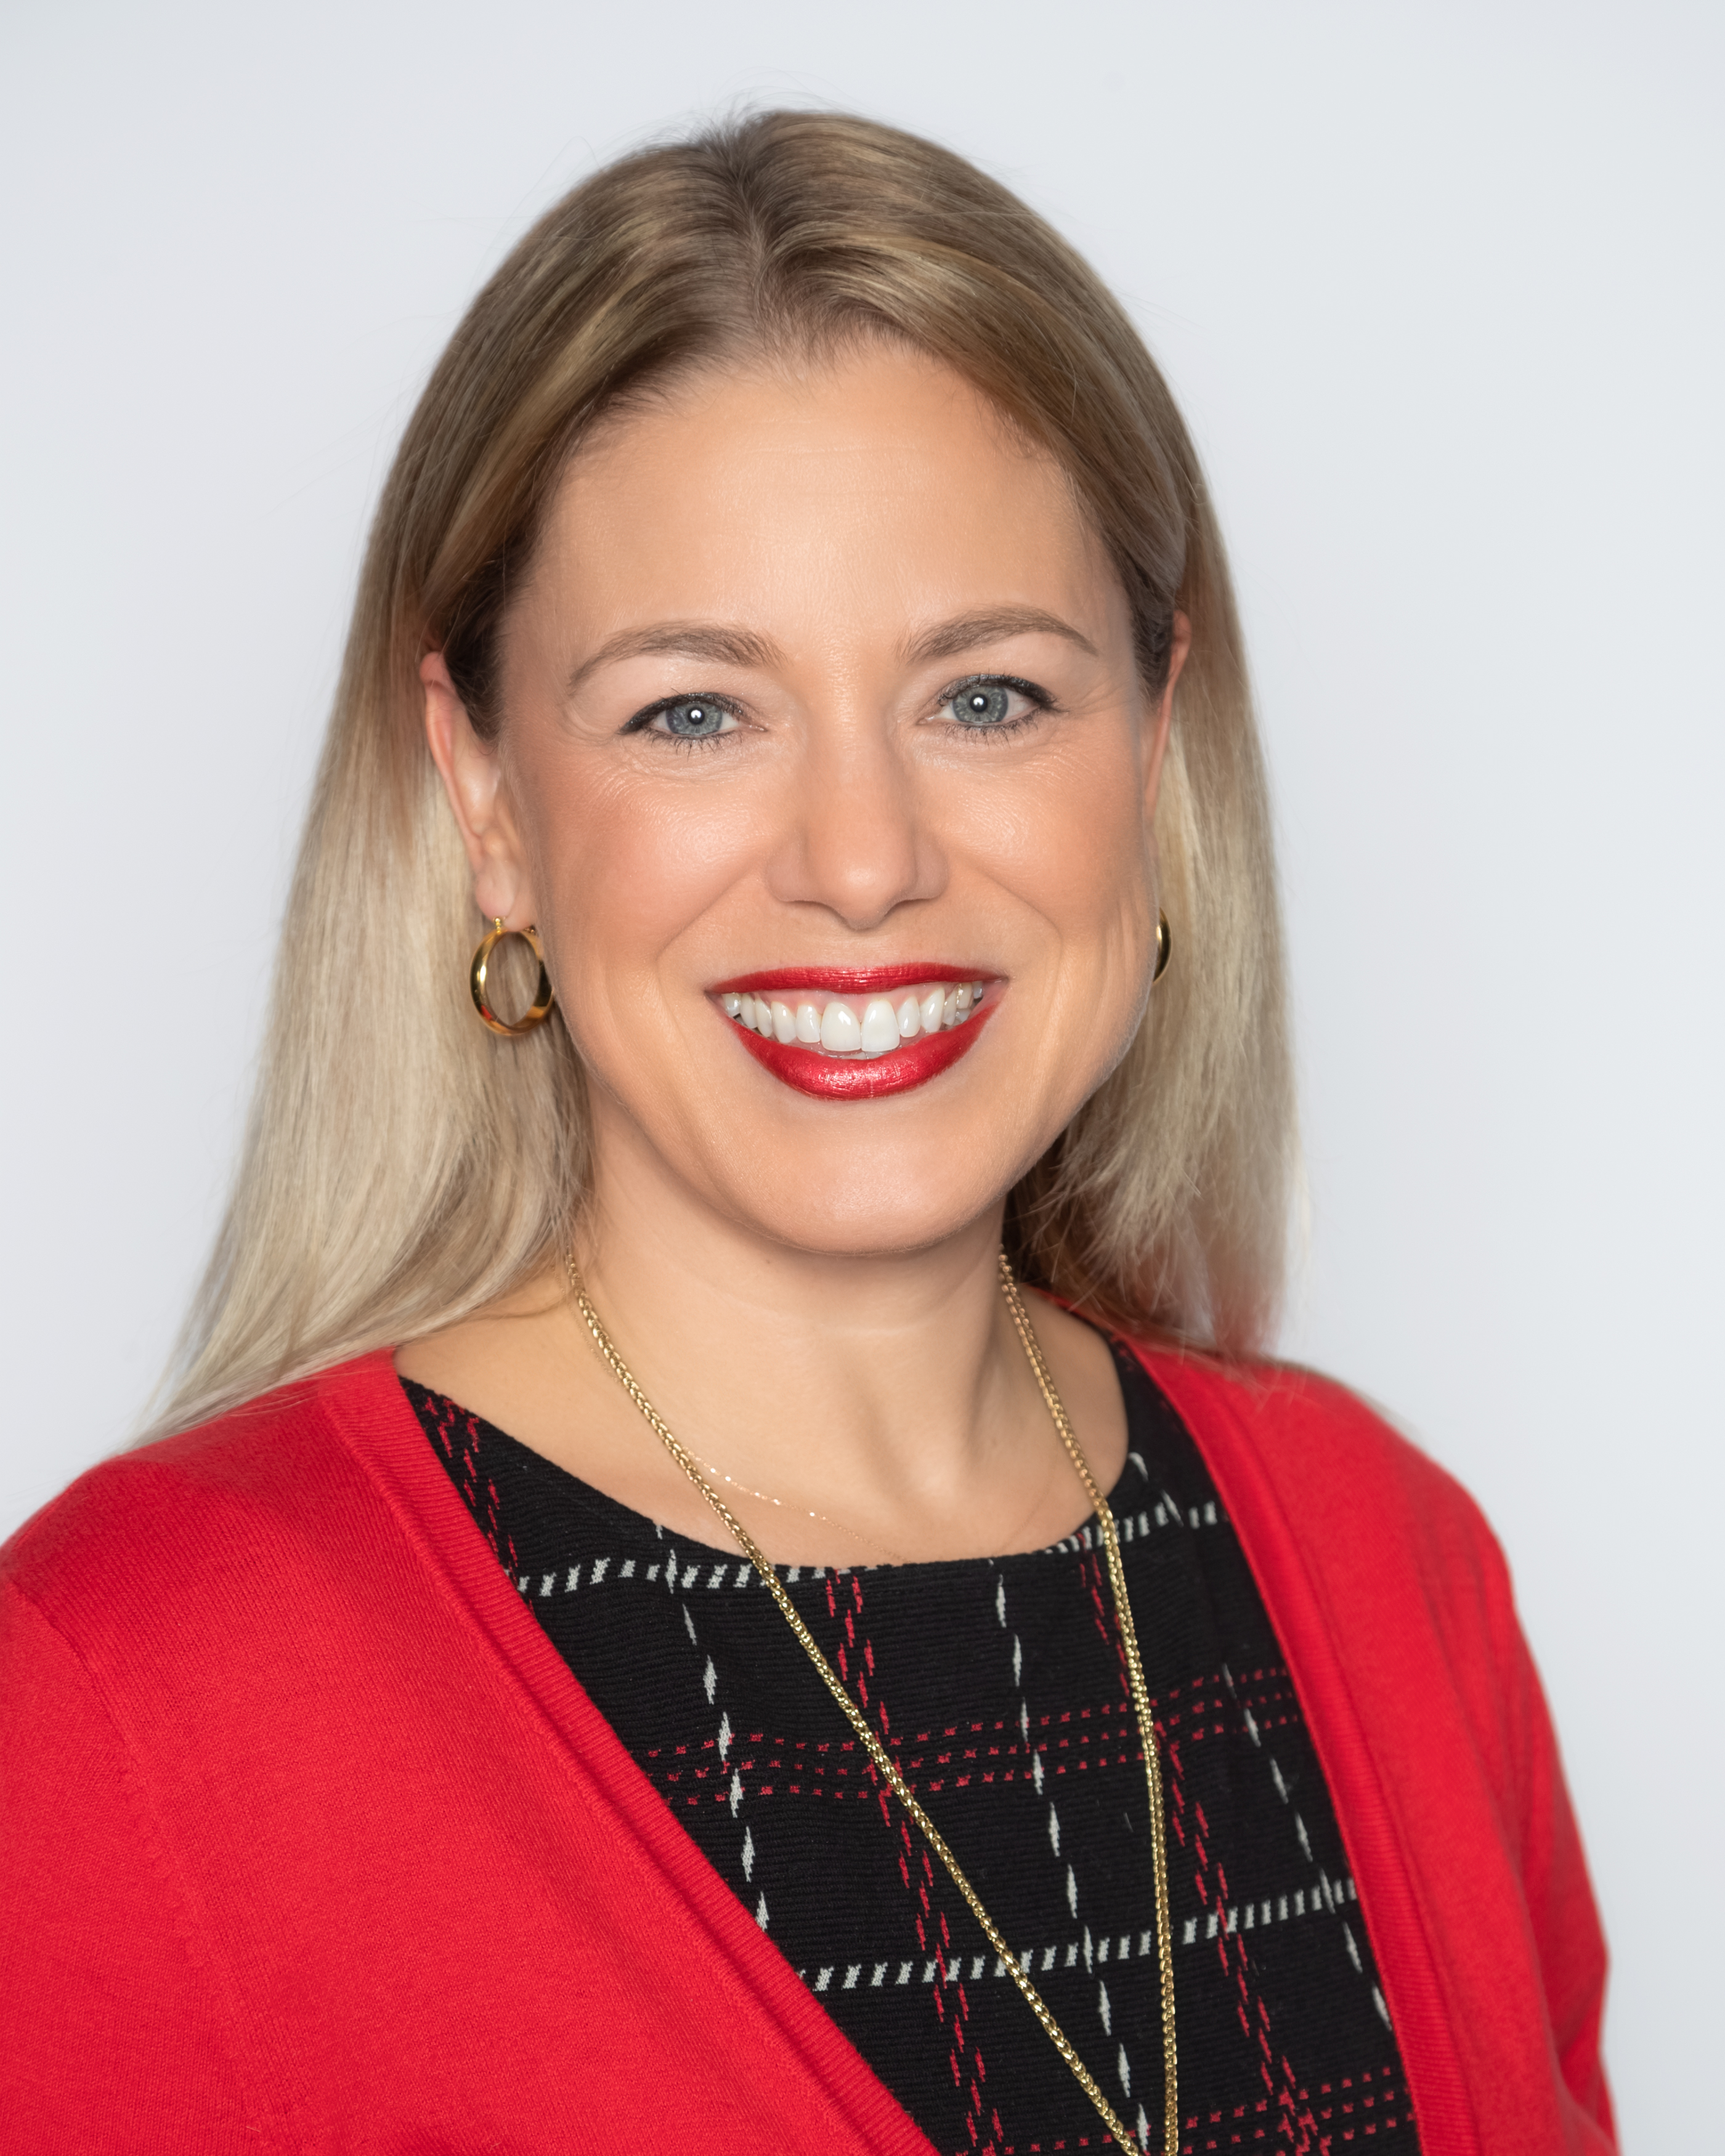 Maggie Biscarr